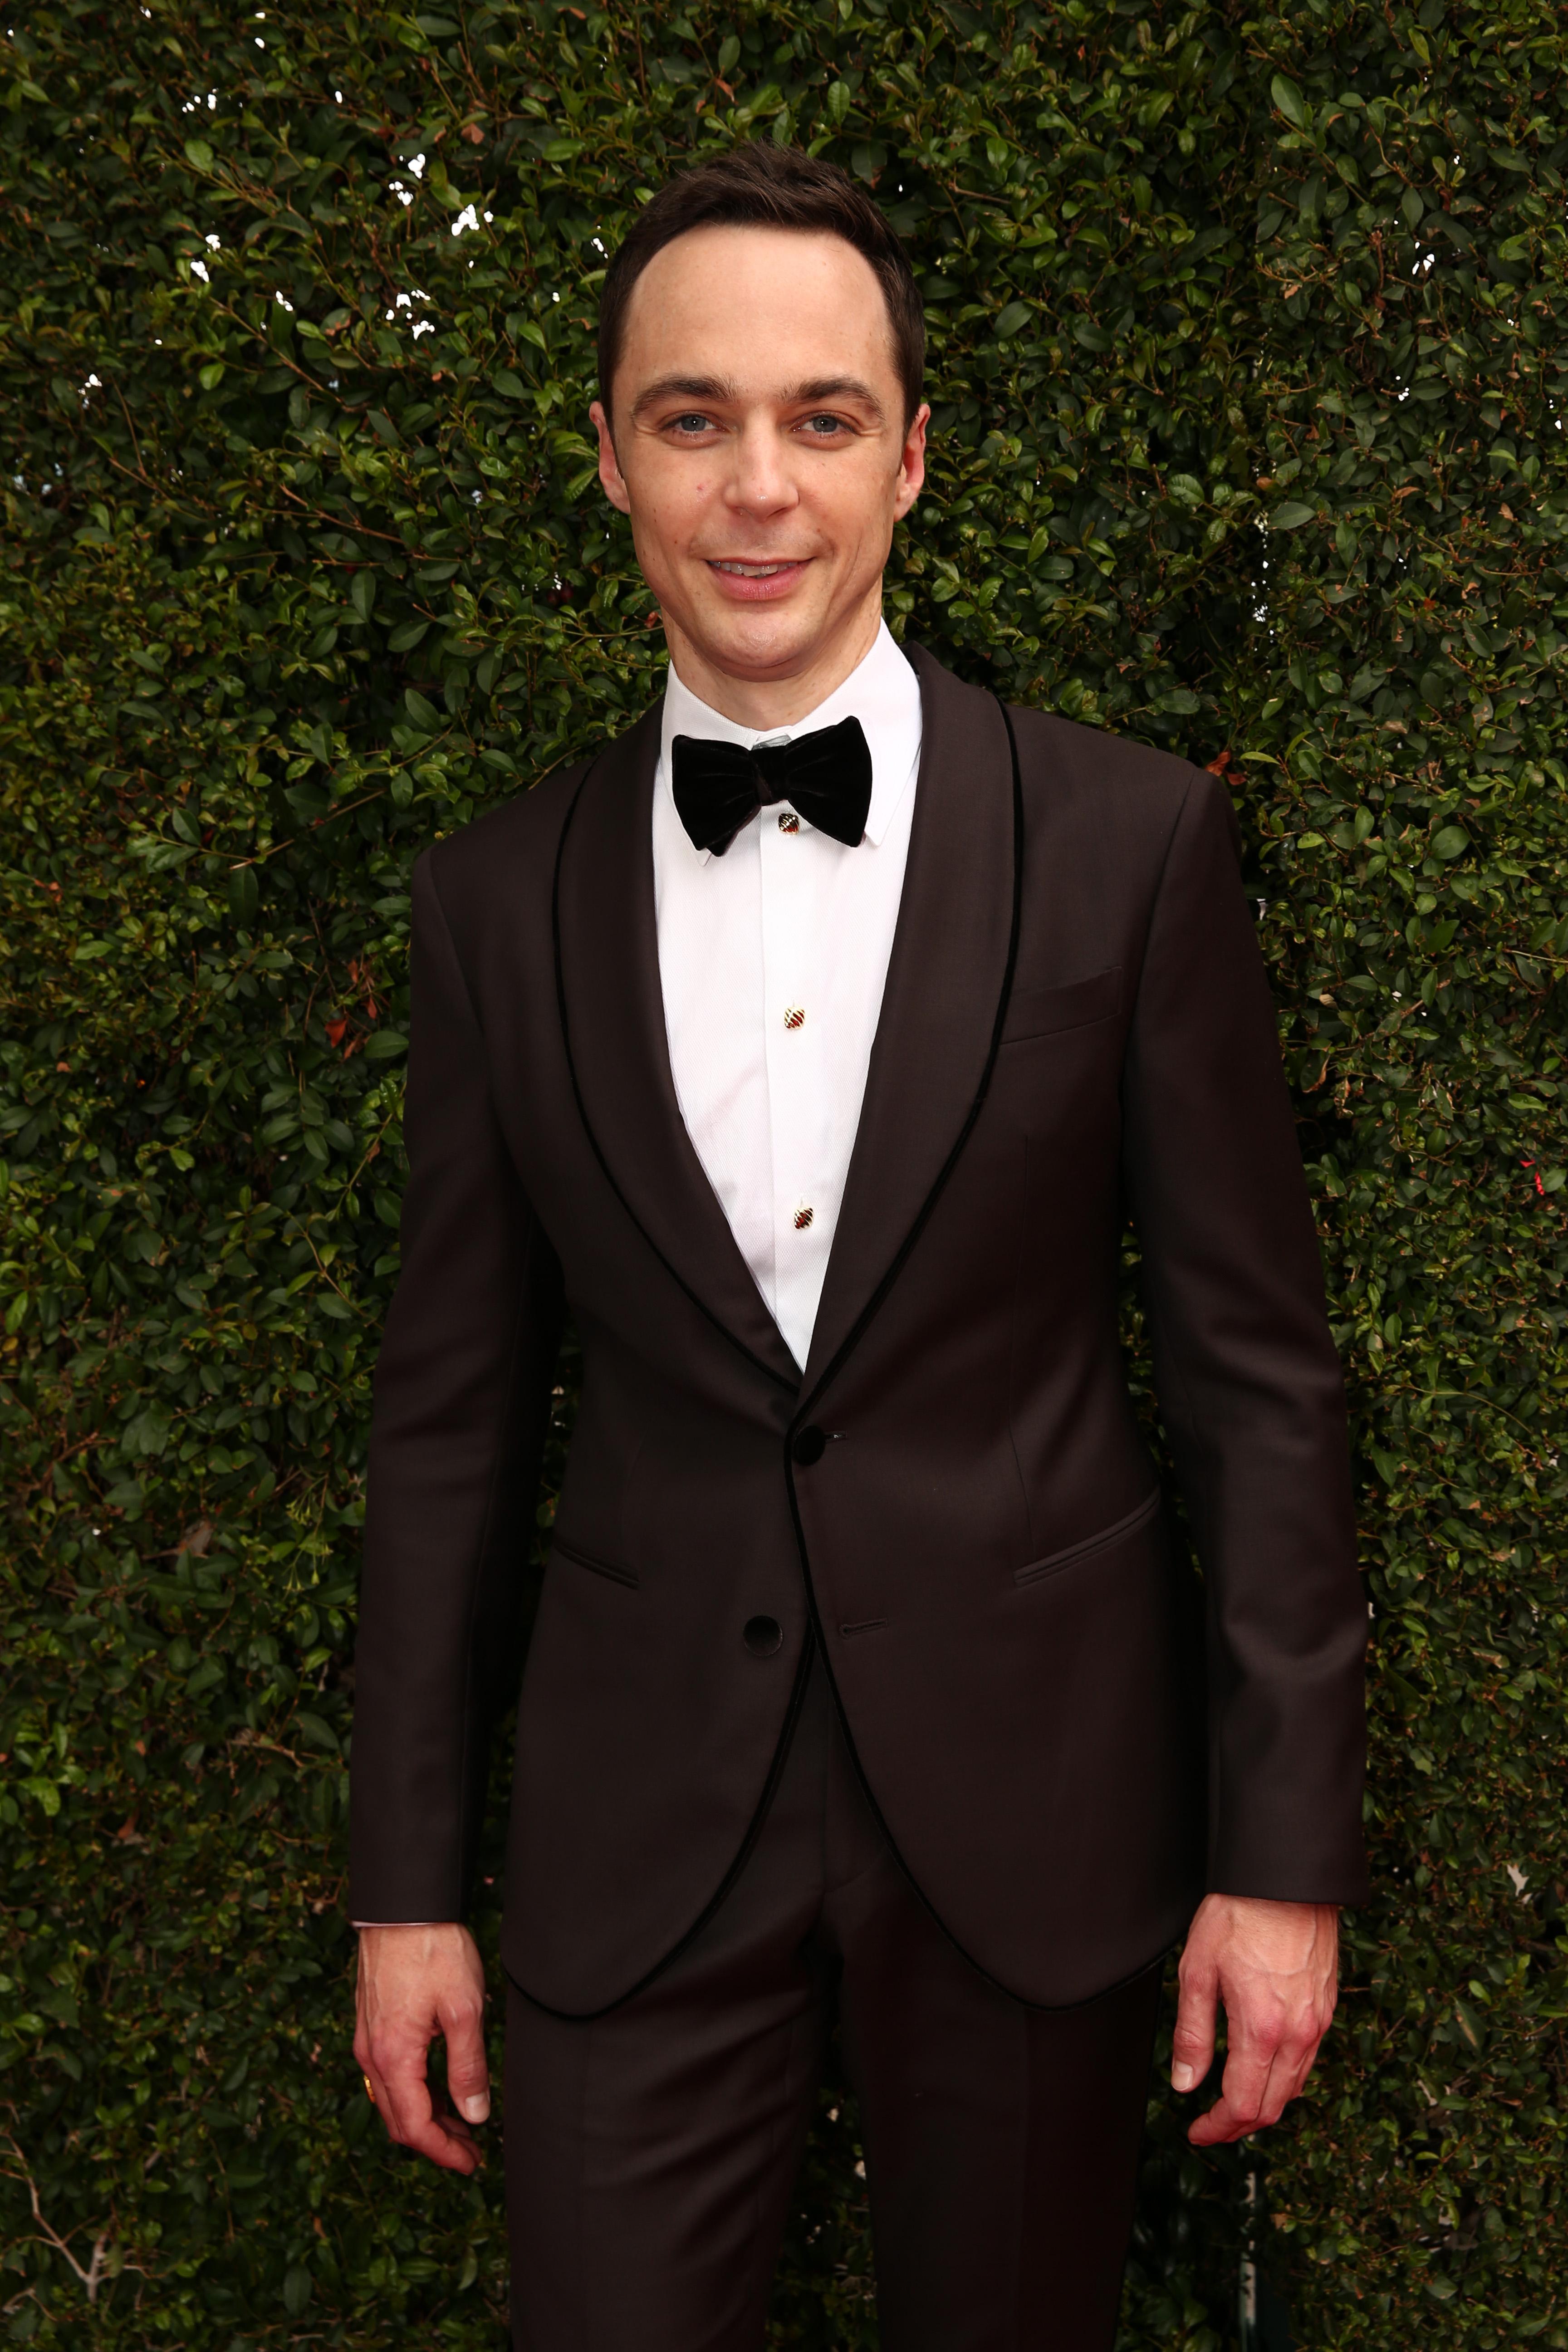 NBC's 66th Annual Primetime Emmy Awards - Red Carpet